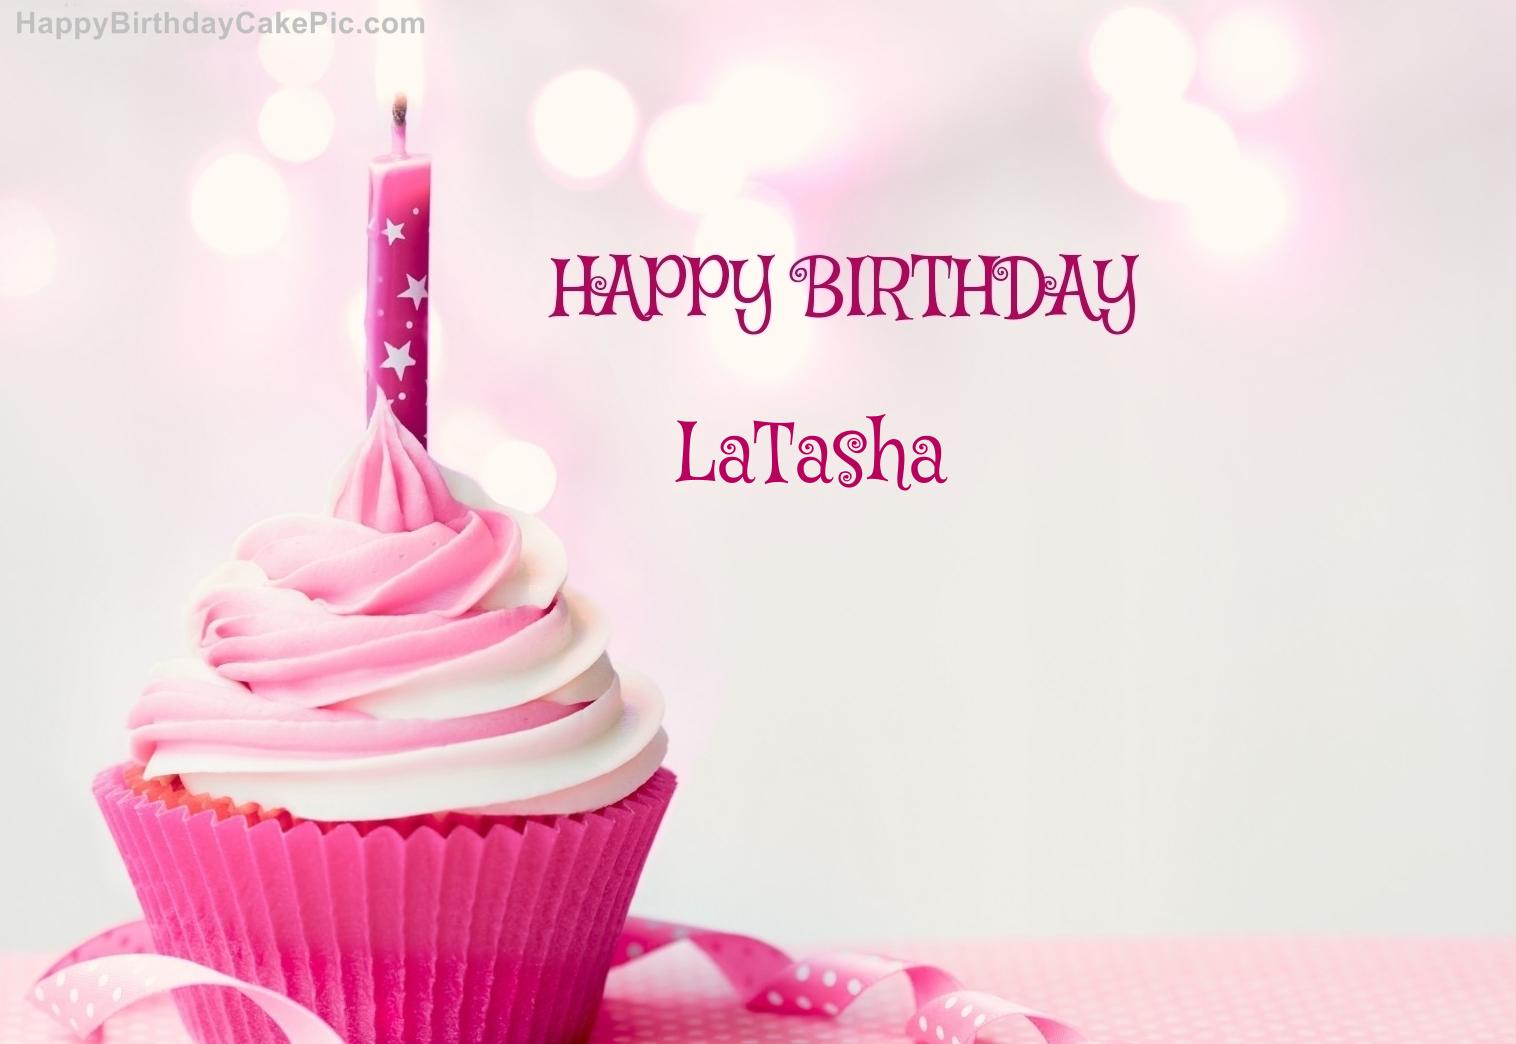 Happy Birthday Cupcake Candle Pink Cake For Latasha